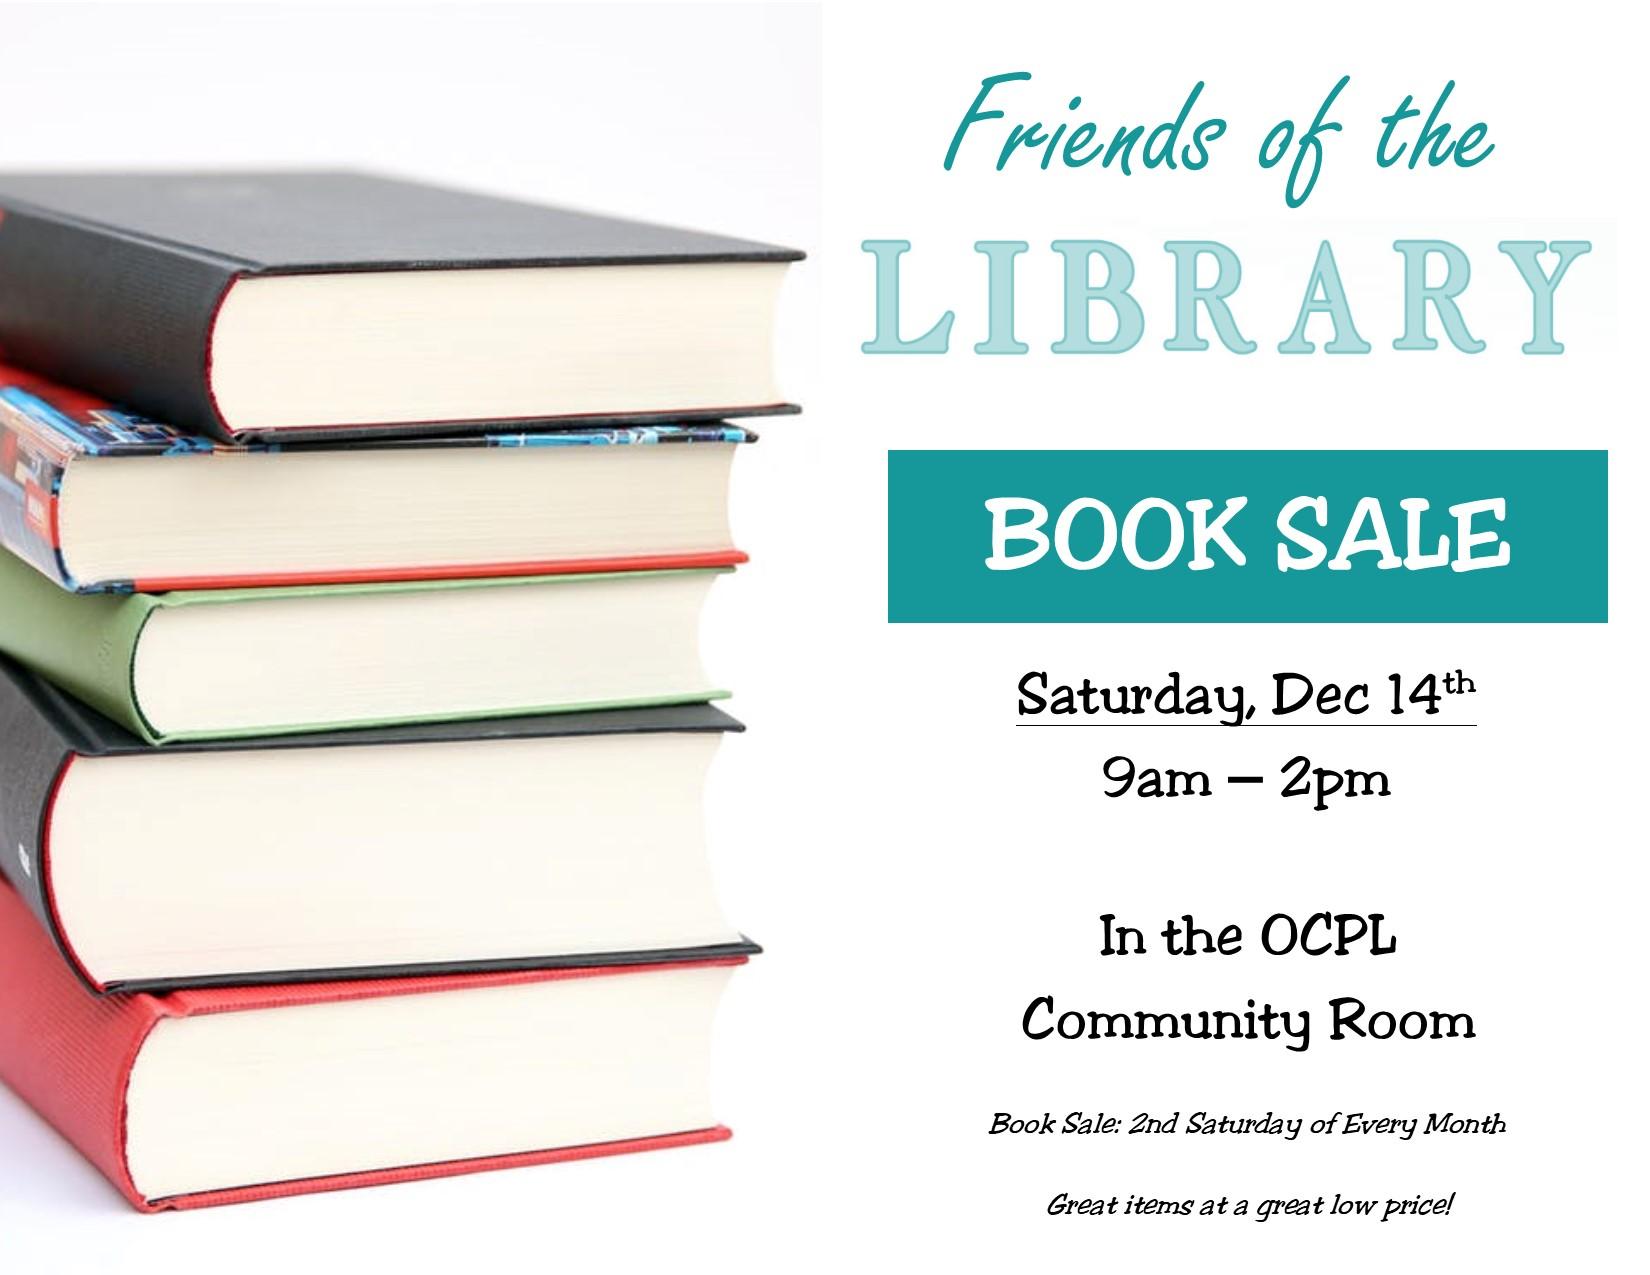 book sale flyer, dec 14th